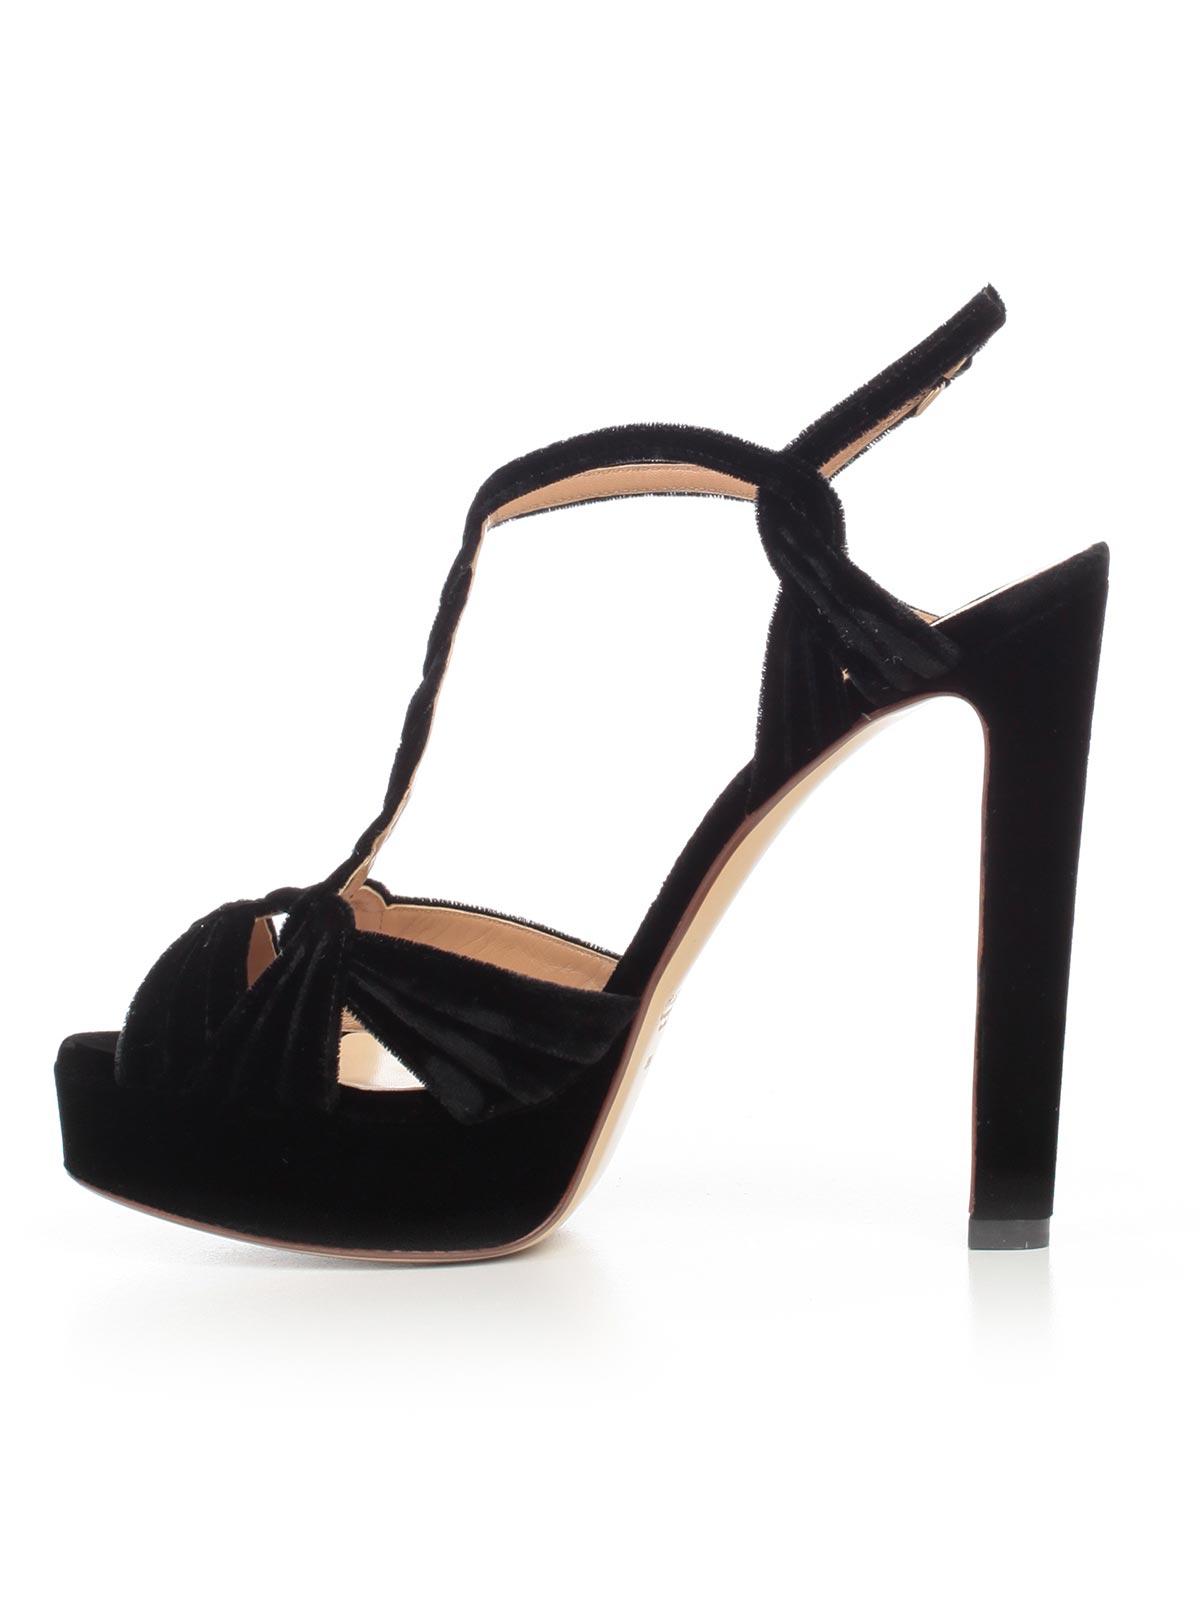 Picture of Francesco Russo Shoes